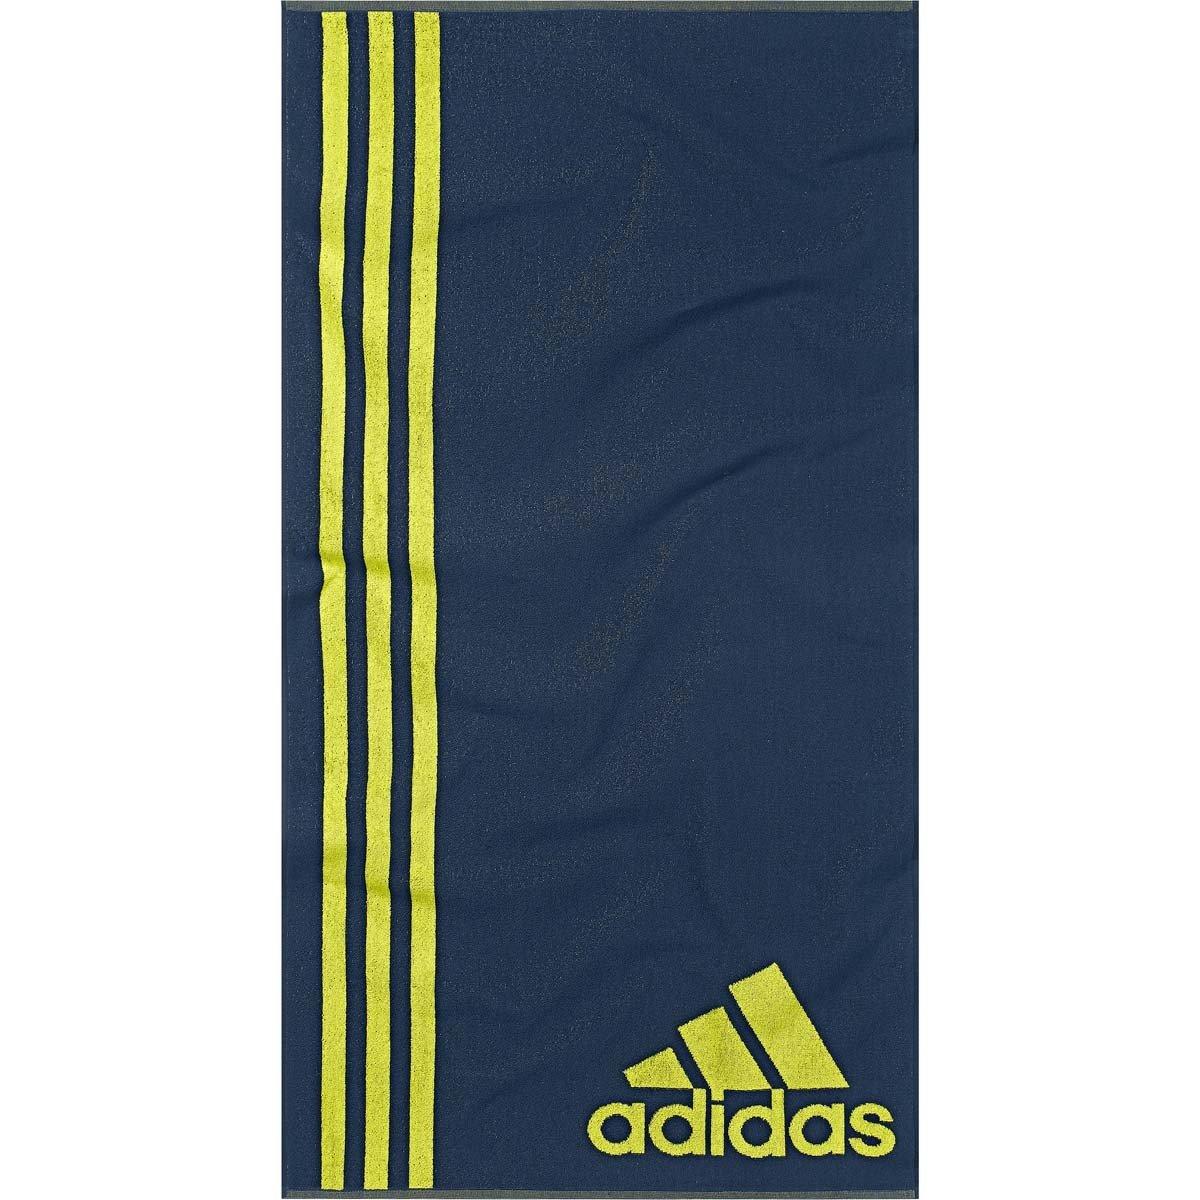 Adidas Towel–Asciugamano, Colore: Blu/Verde Adidas Towel-Asciugamano